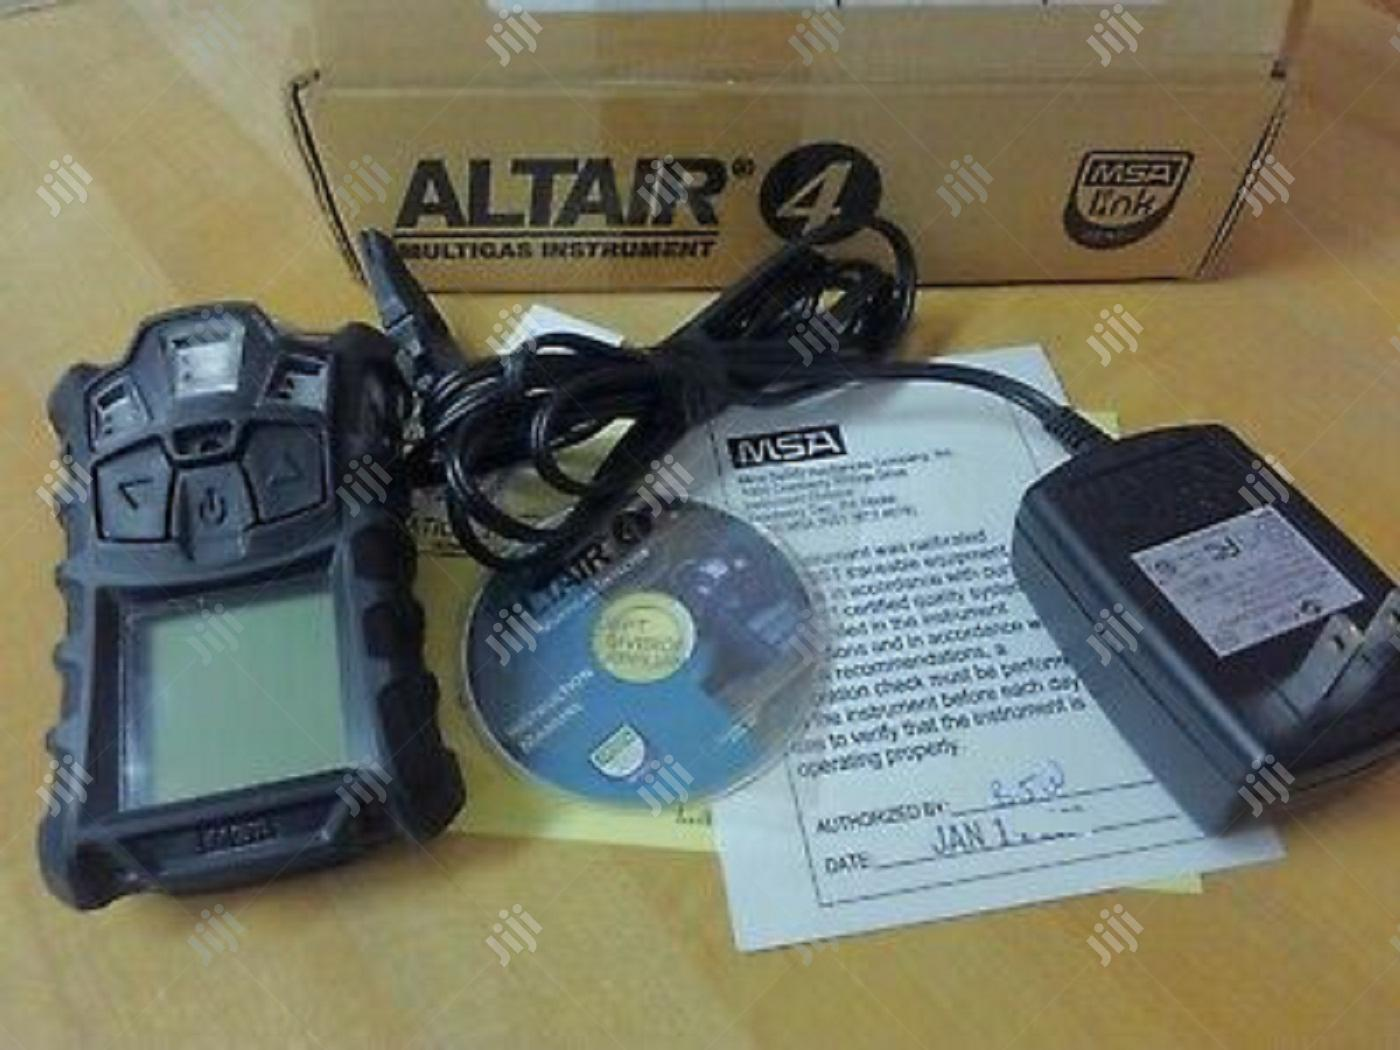 MSA Altair 5X PID Multigas Detector,Gas Detection